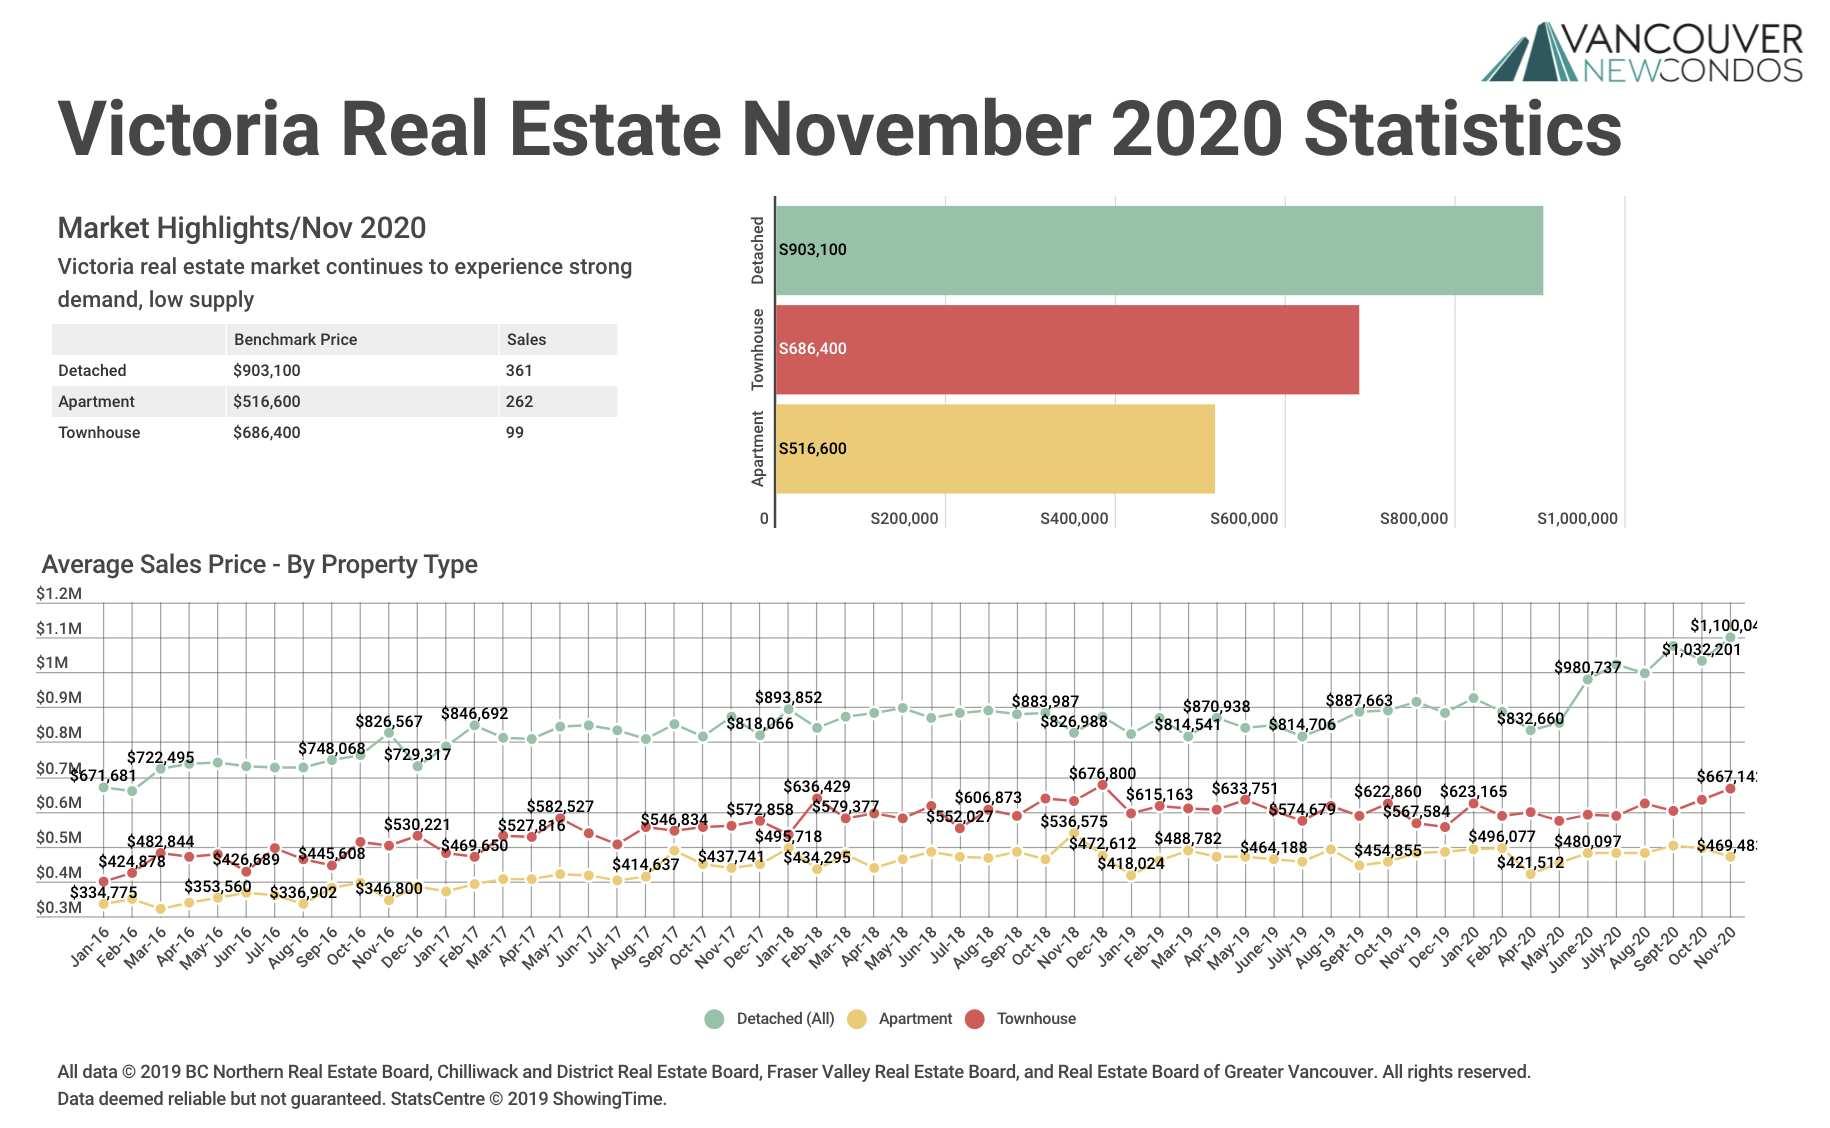 VREB Nov 2020 Stats Graph